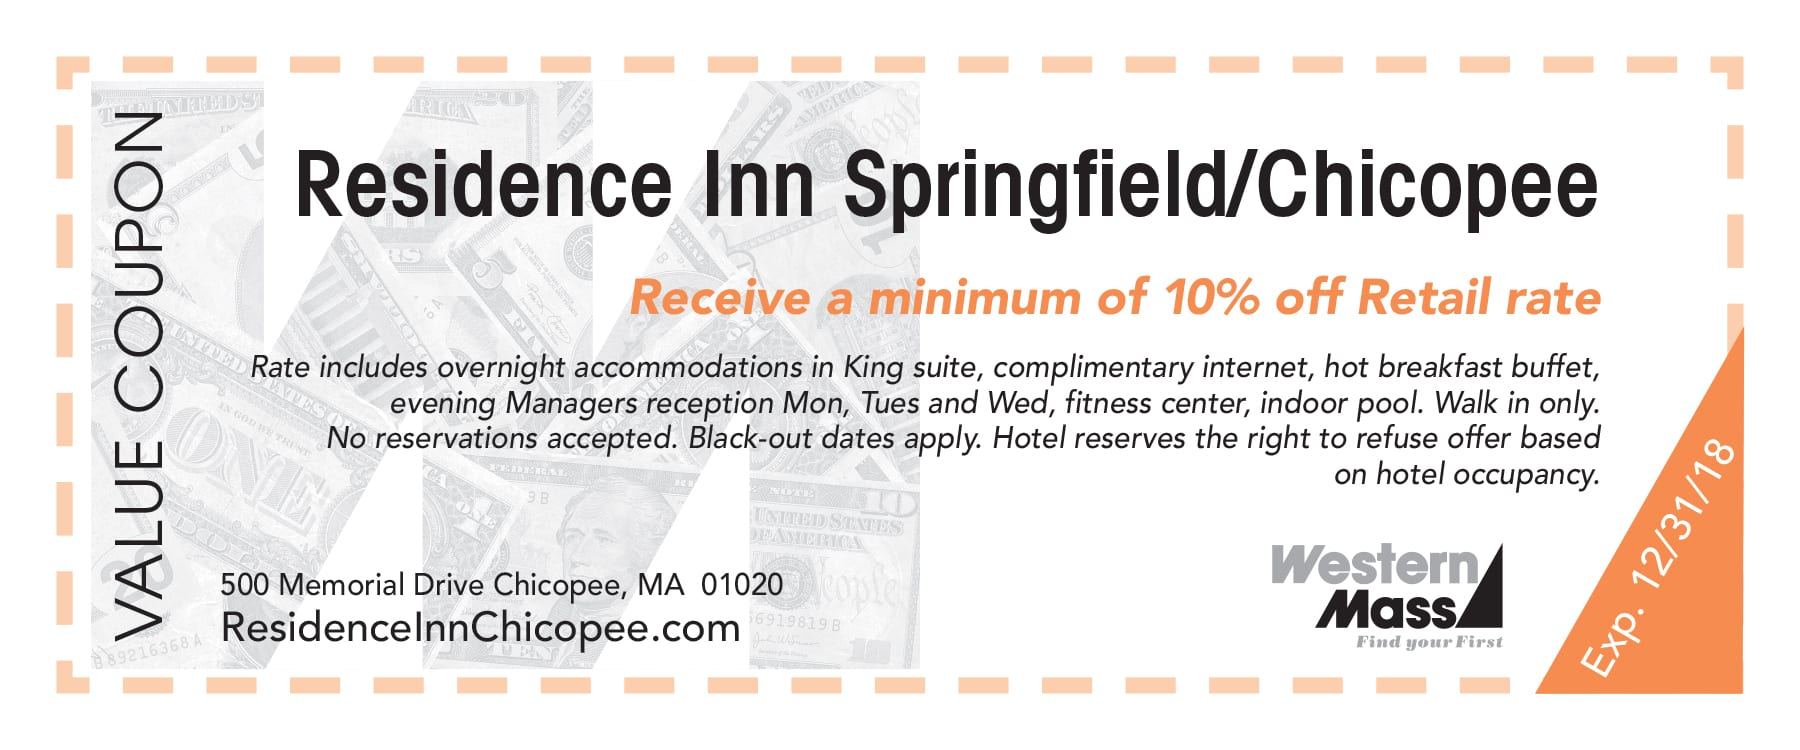 Residence Inn Springfield/ Chicopee